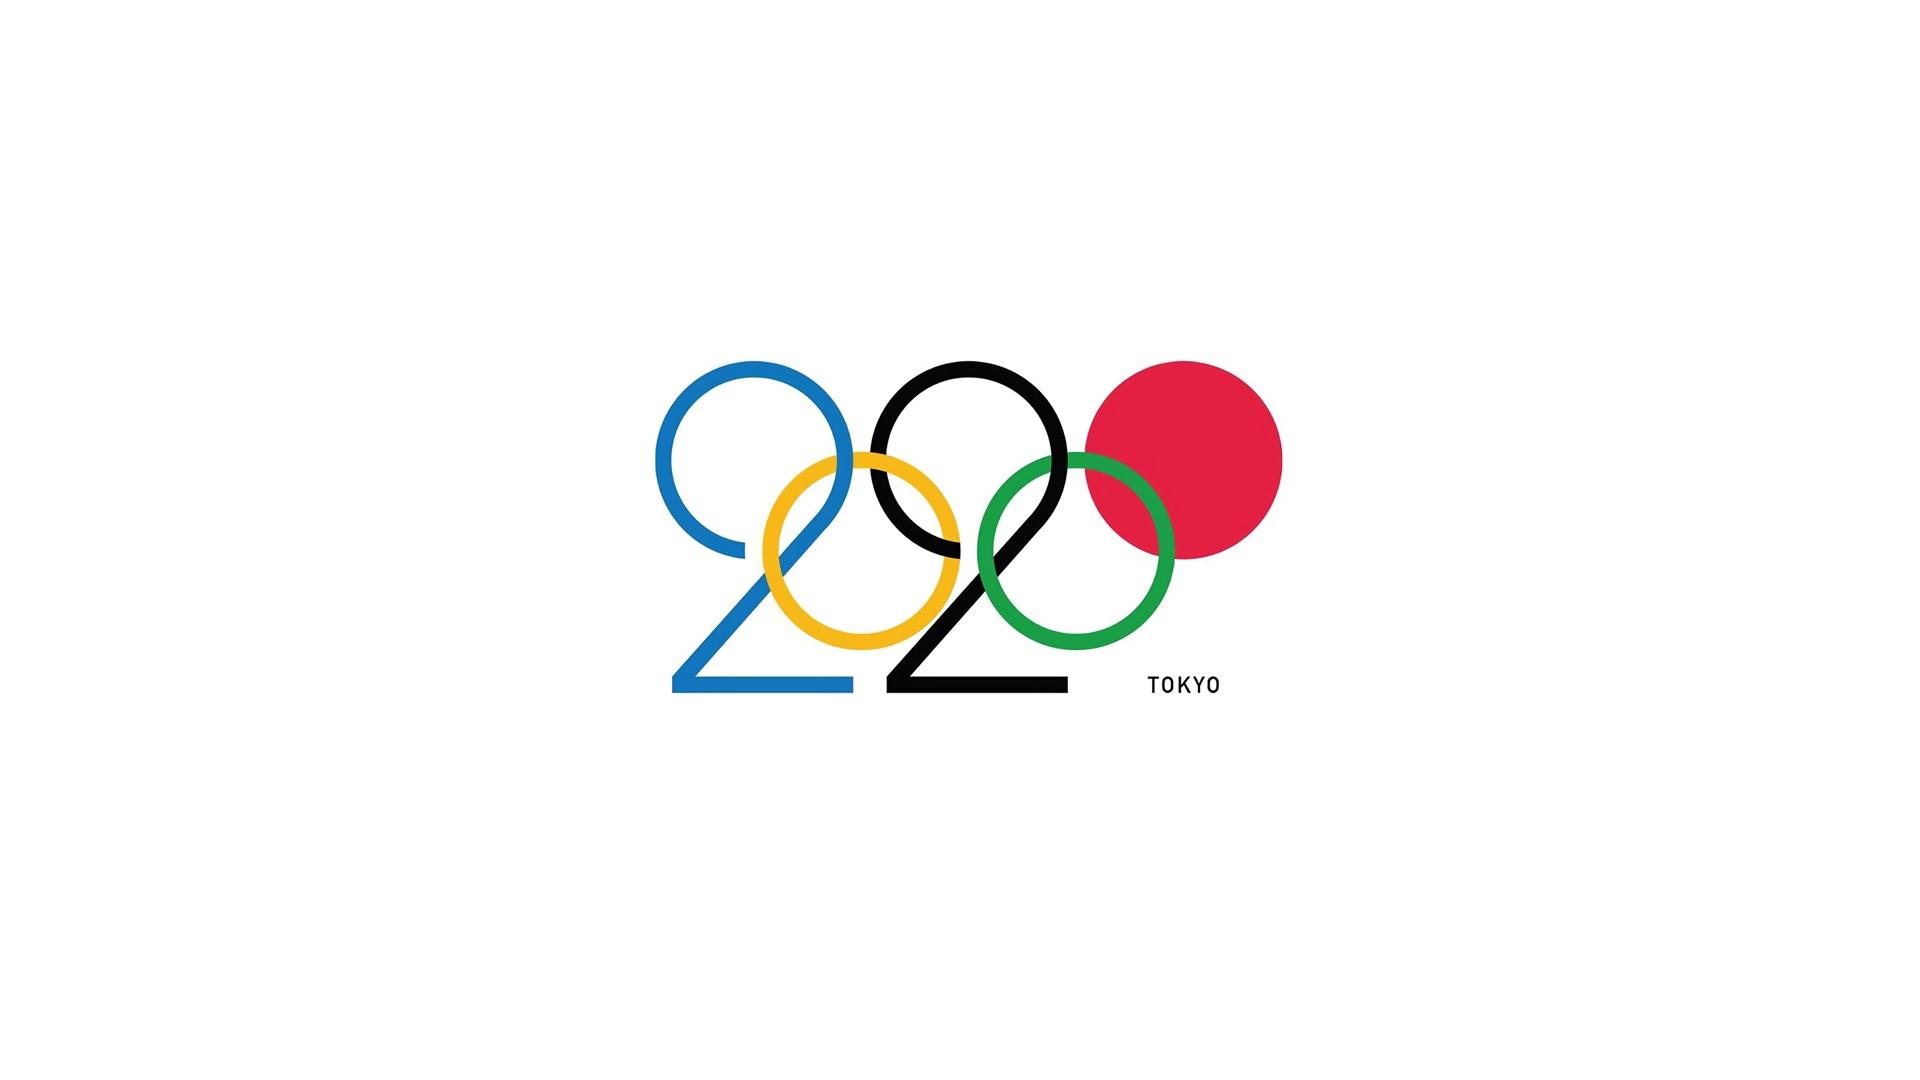 Tokyo 2020 Olympics pc wallpaper